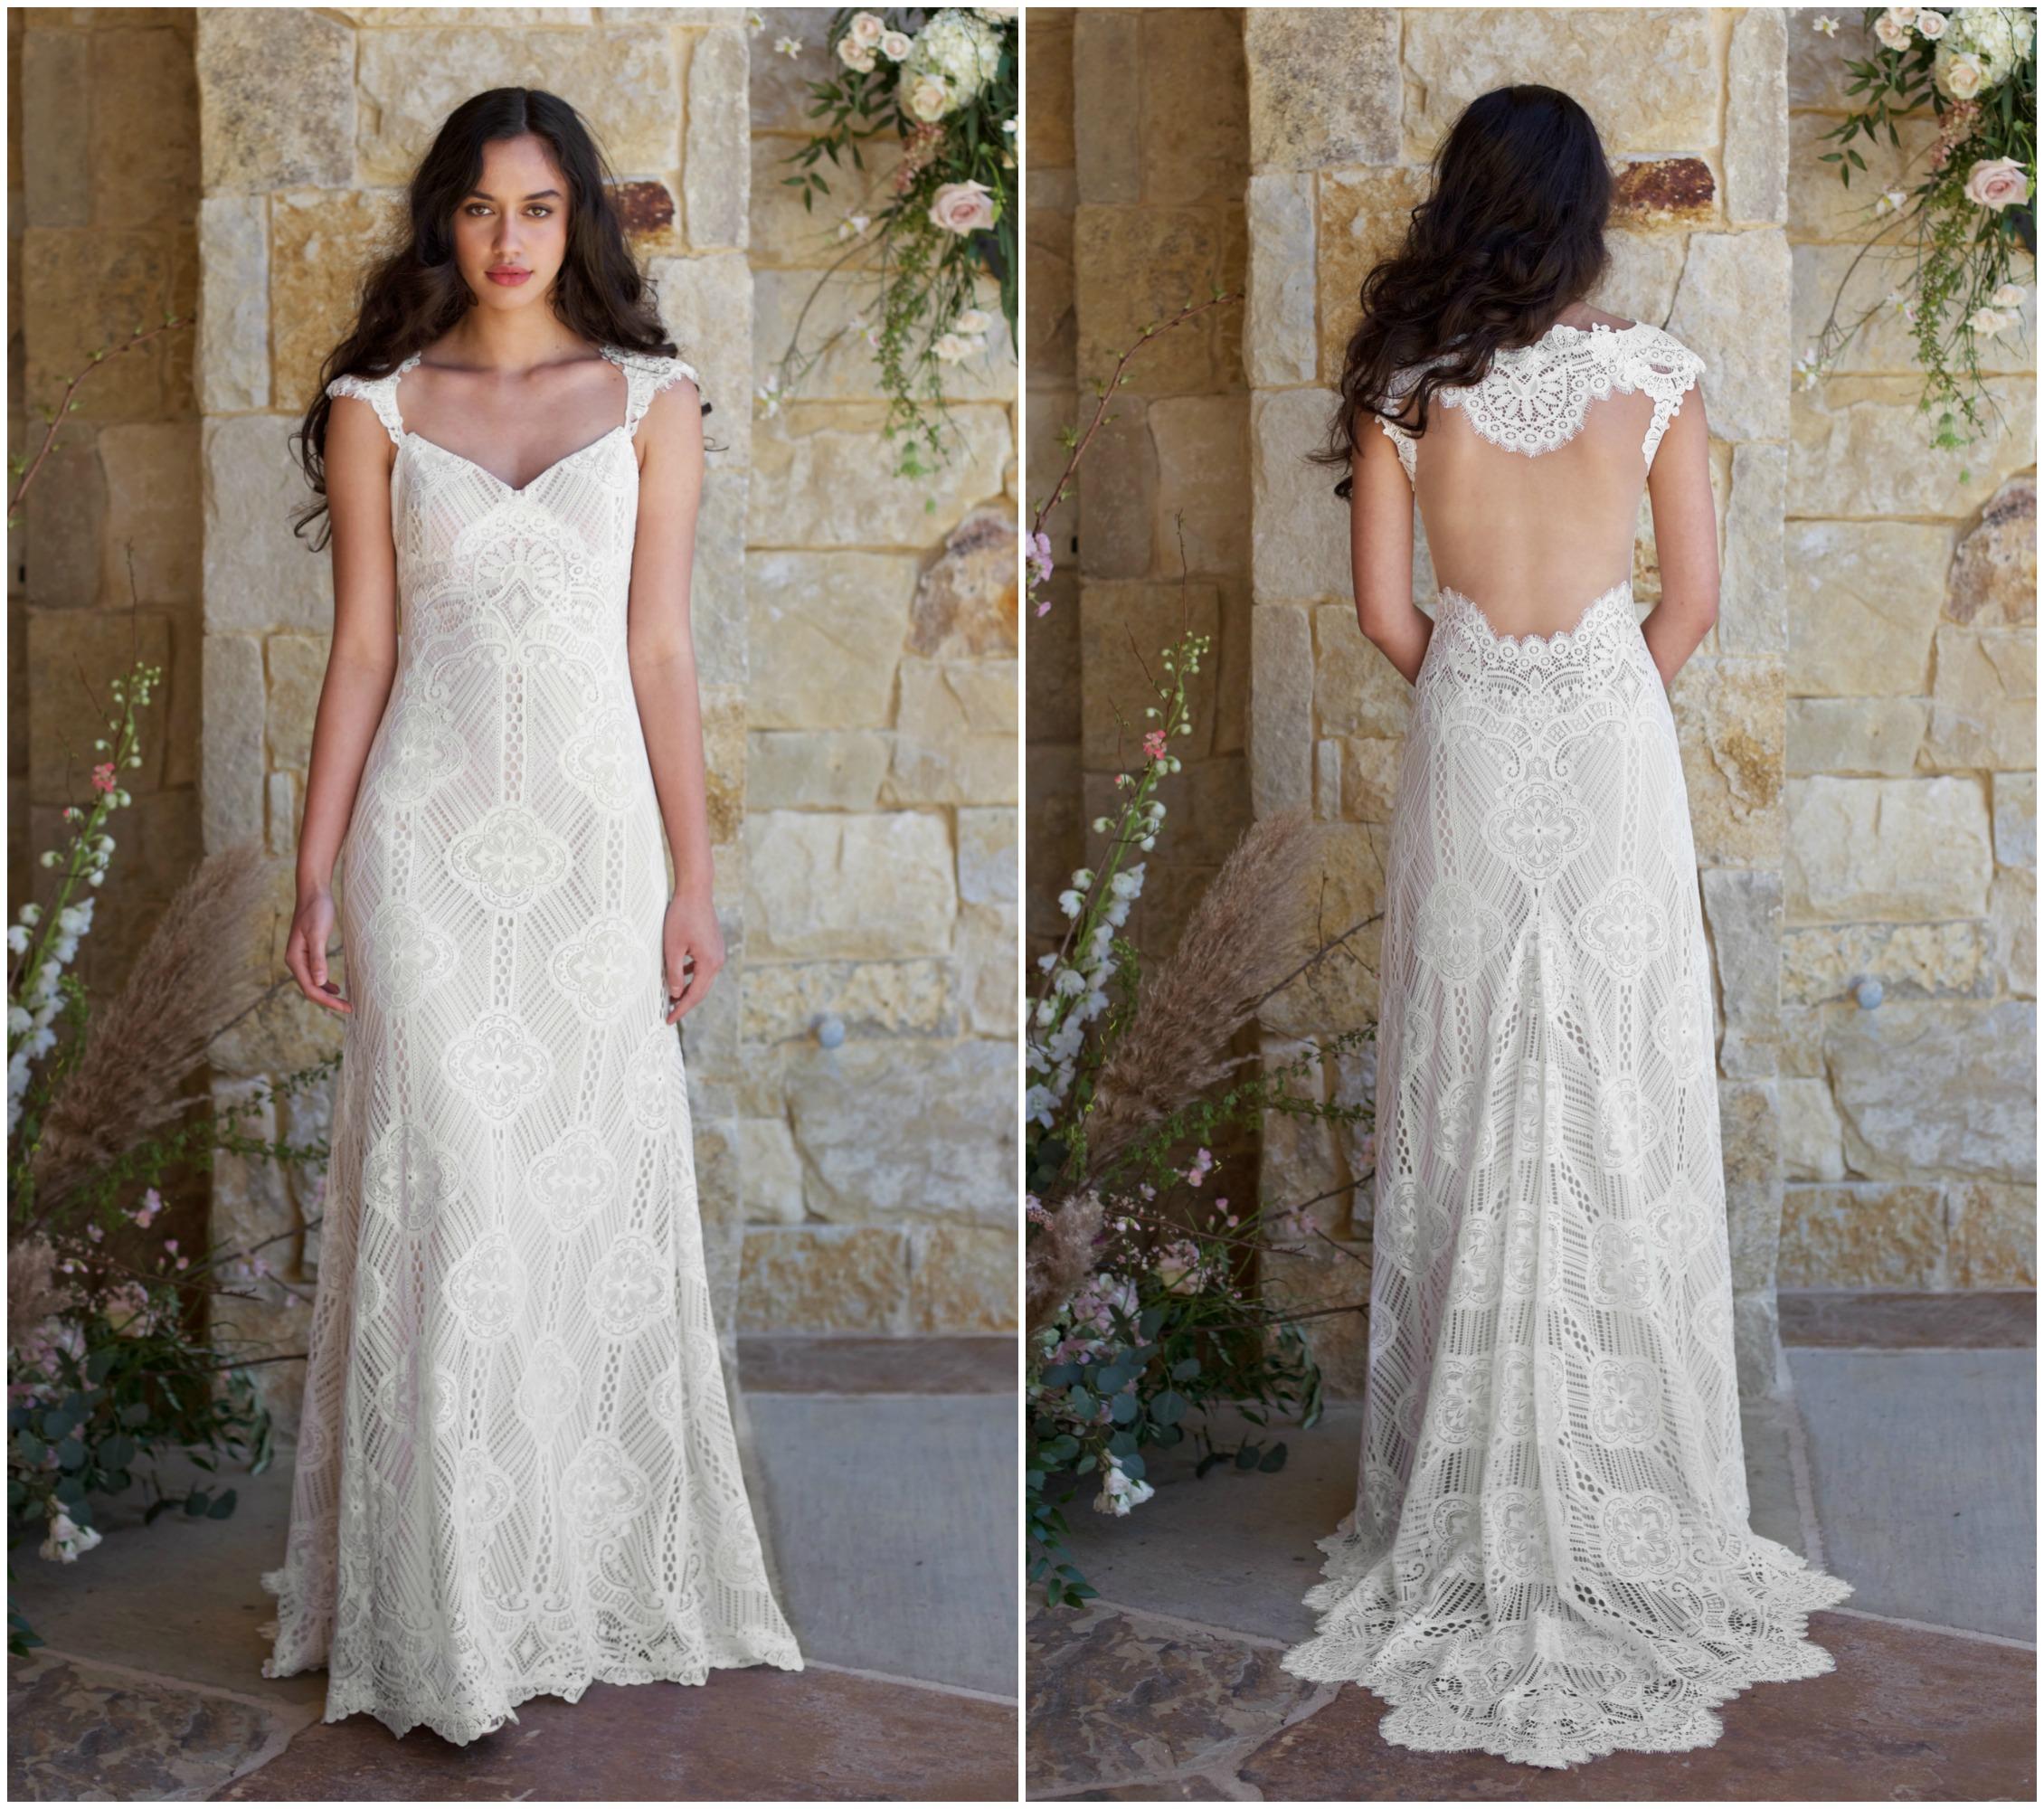 Rustic Wedding Dresses: Claire Pettibone Romantique Spring 2018 Collection